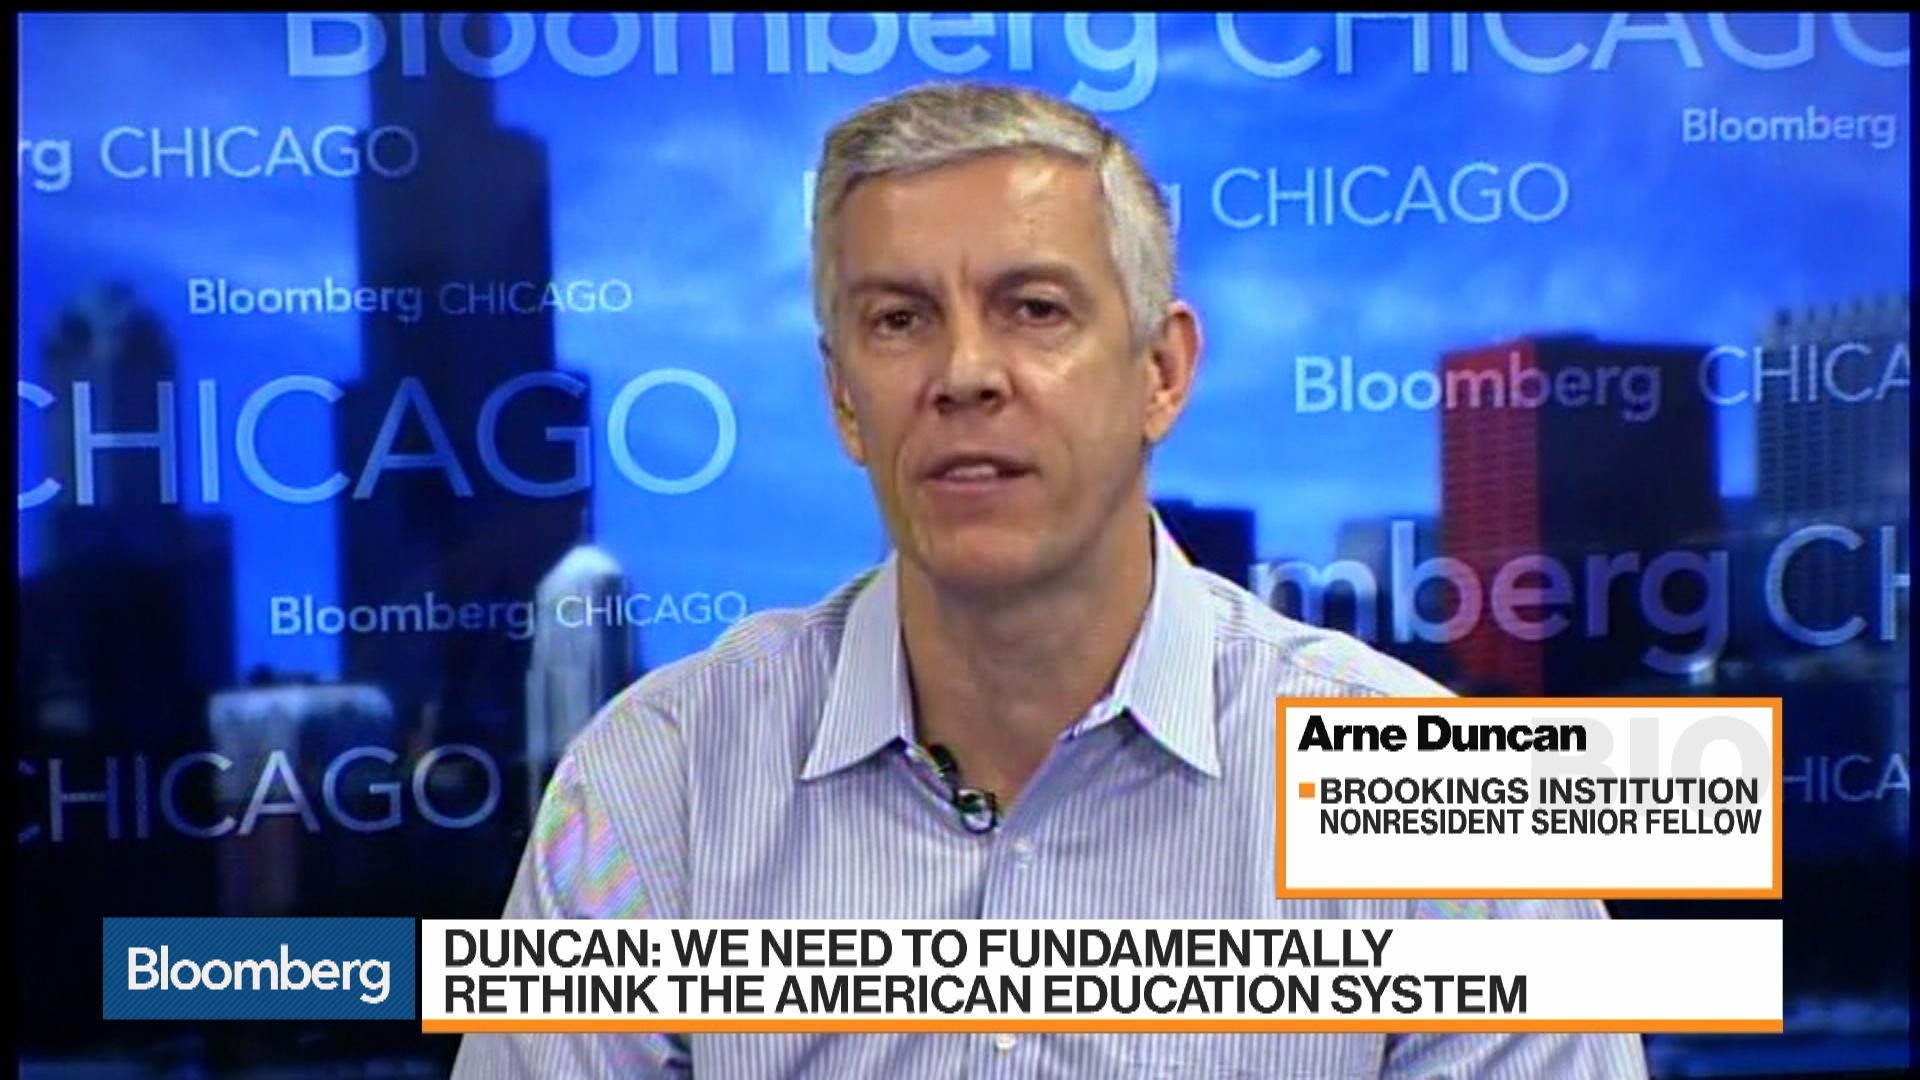 Arne Duncan on How AI Will Impact Future Jobs